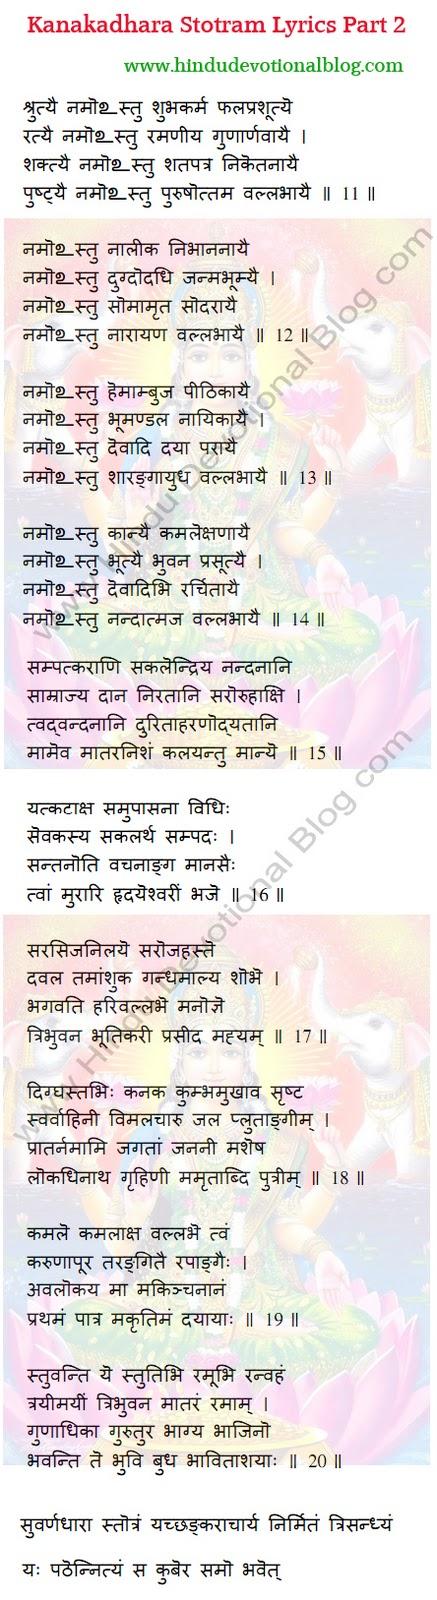 Ashta Lakshmi Stotram Lyrics - Asthalakshmi Stotra | Hindu ...